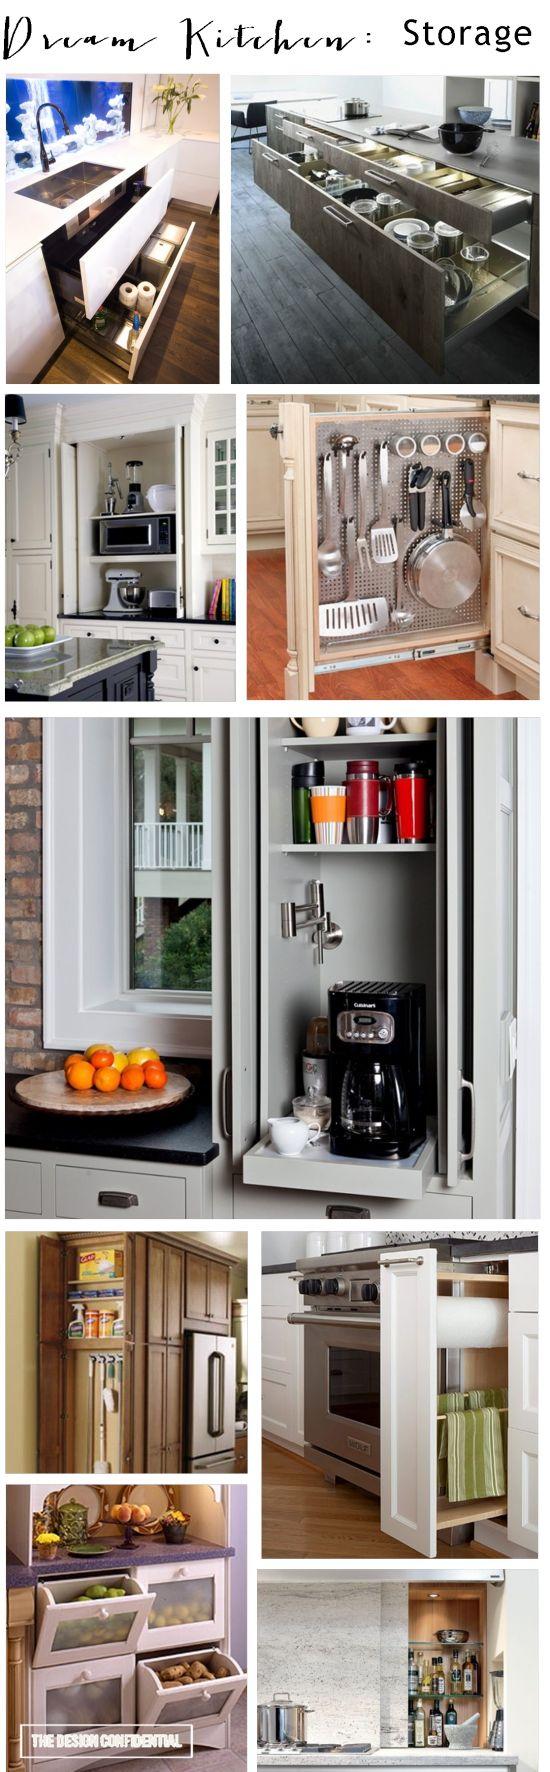 Clever Kitchen 17 Best Images About Kitchen On Pinterest Drawer Pulls Kitchen